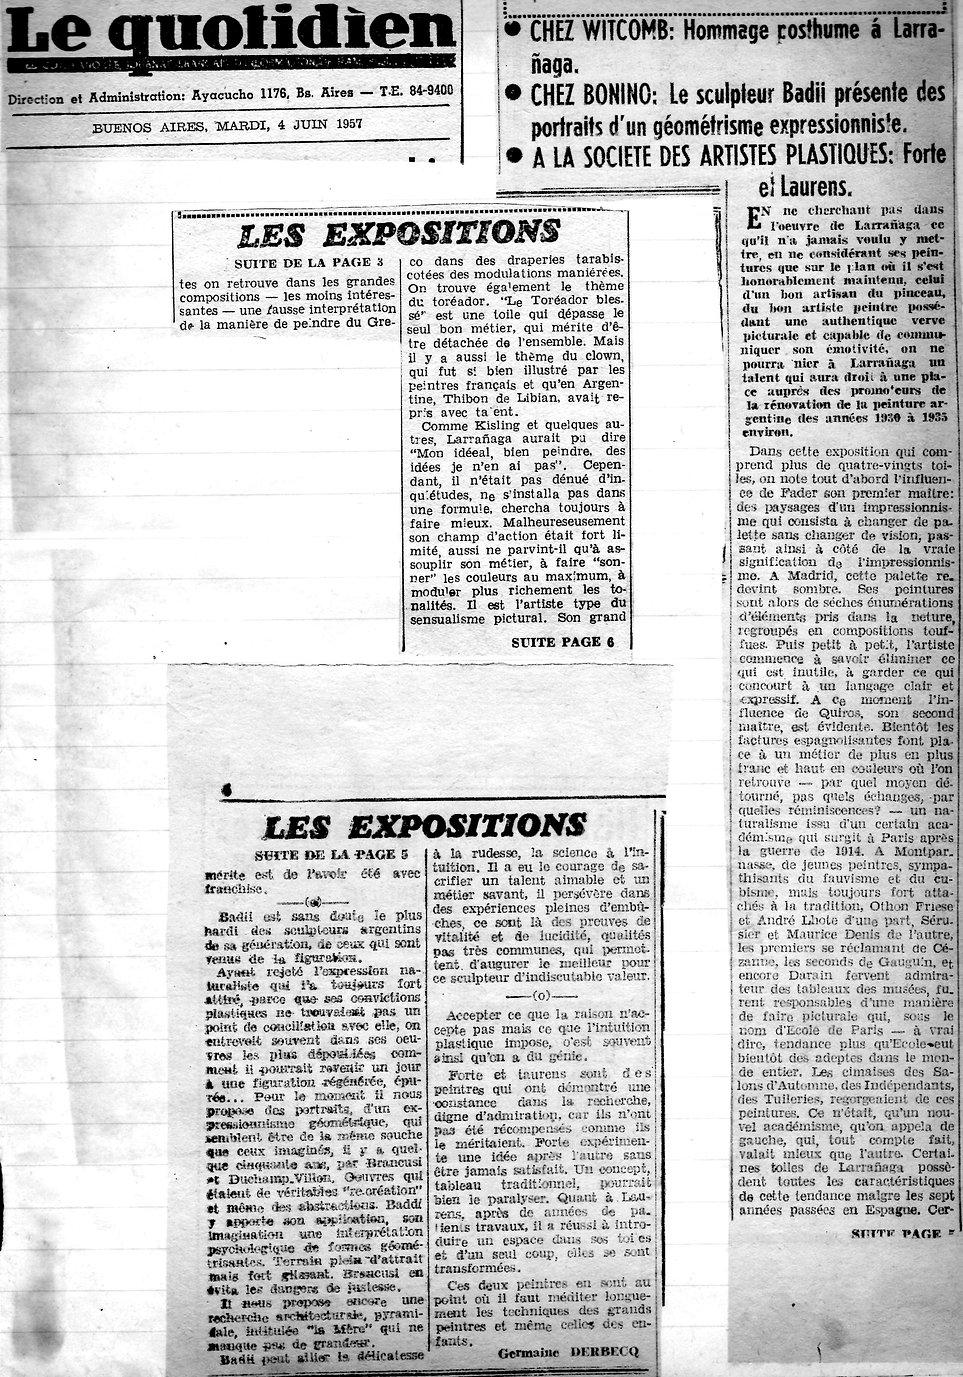 Le Quotidien2 - Chez Witcomb.jpg